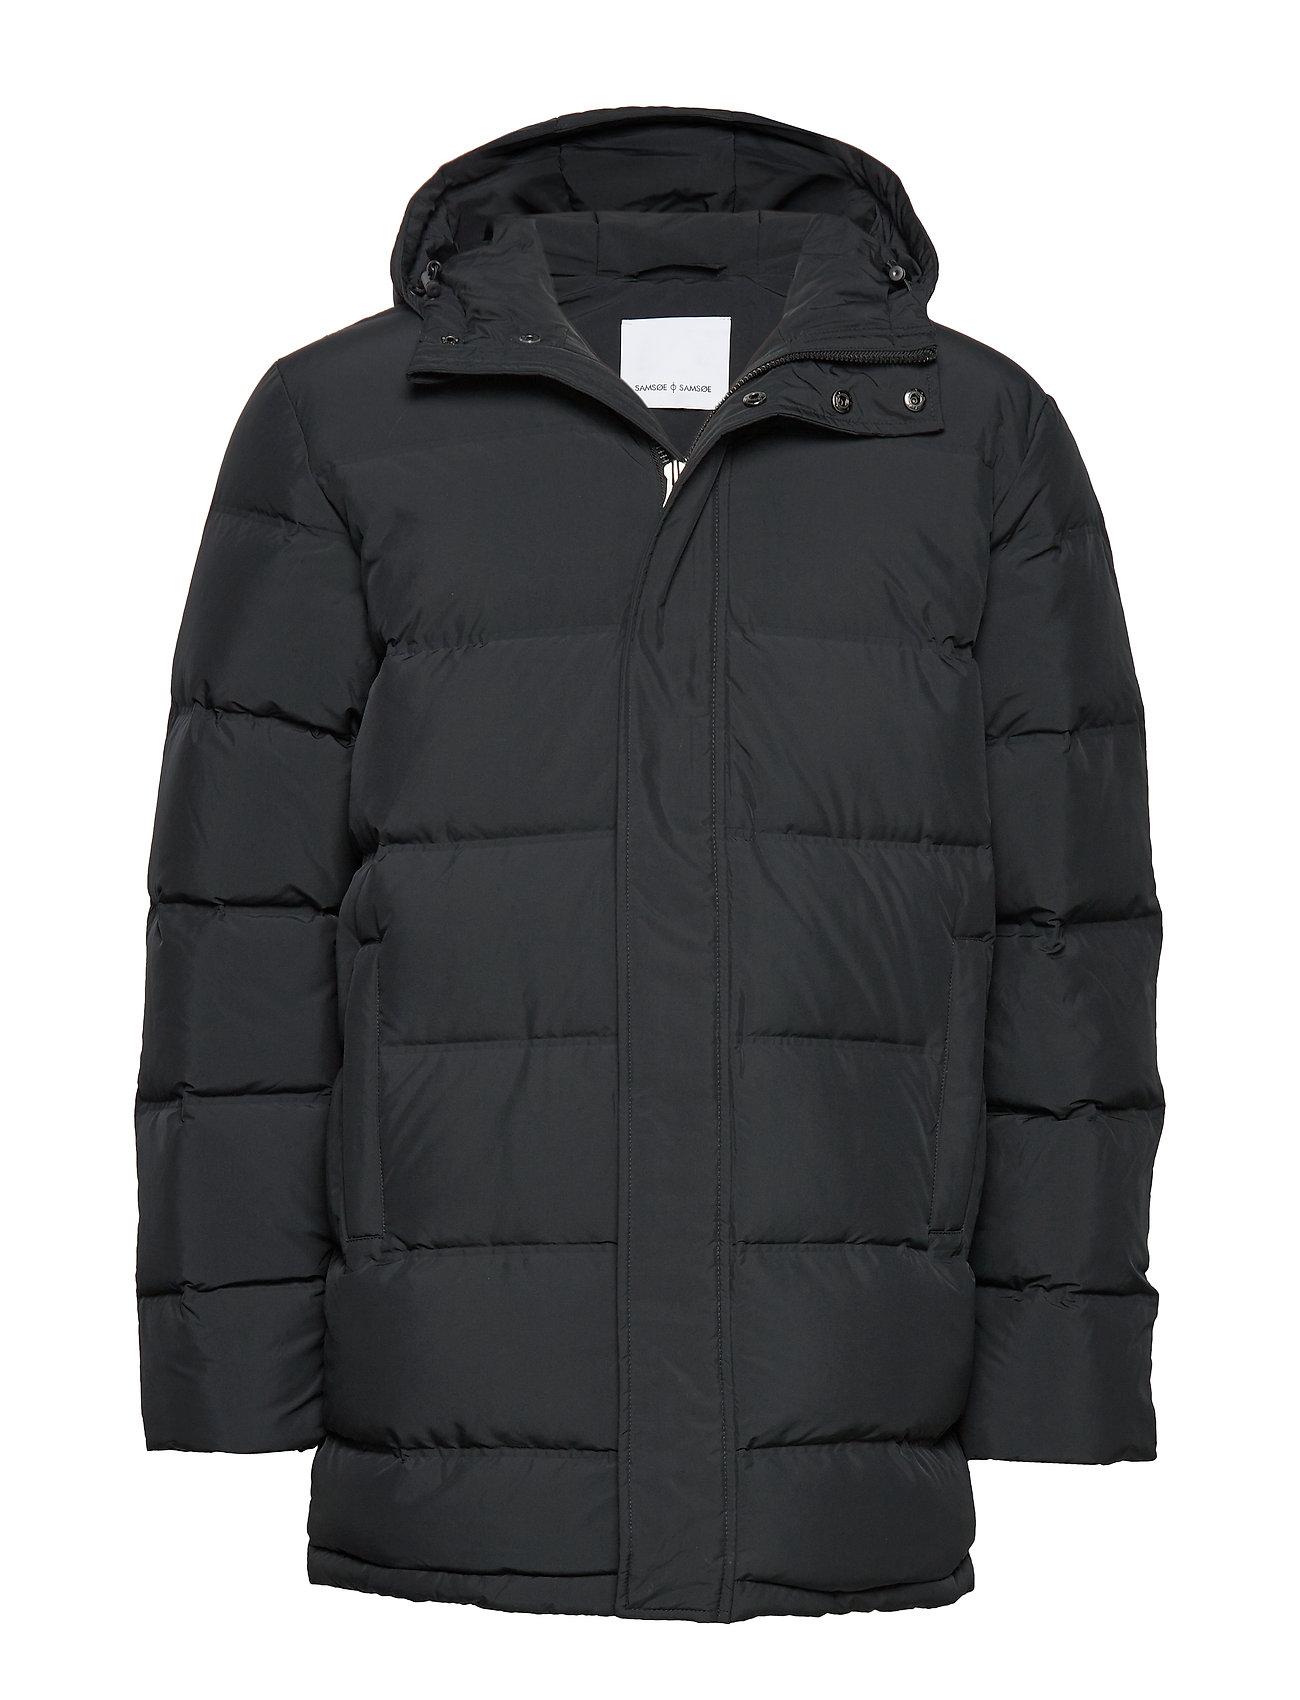 Samsøe & Samsøe Bjar jacket 8306 - BLACK